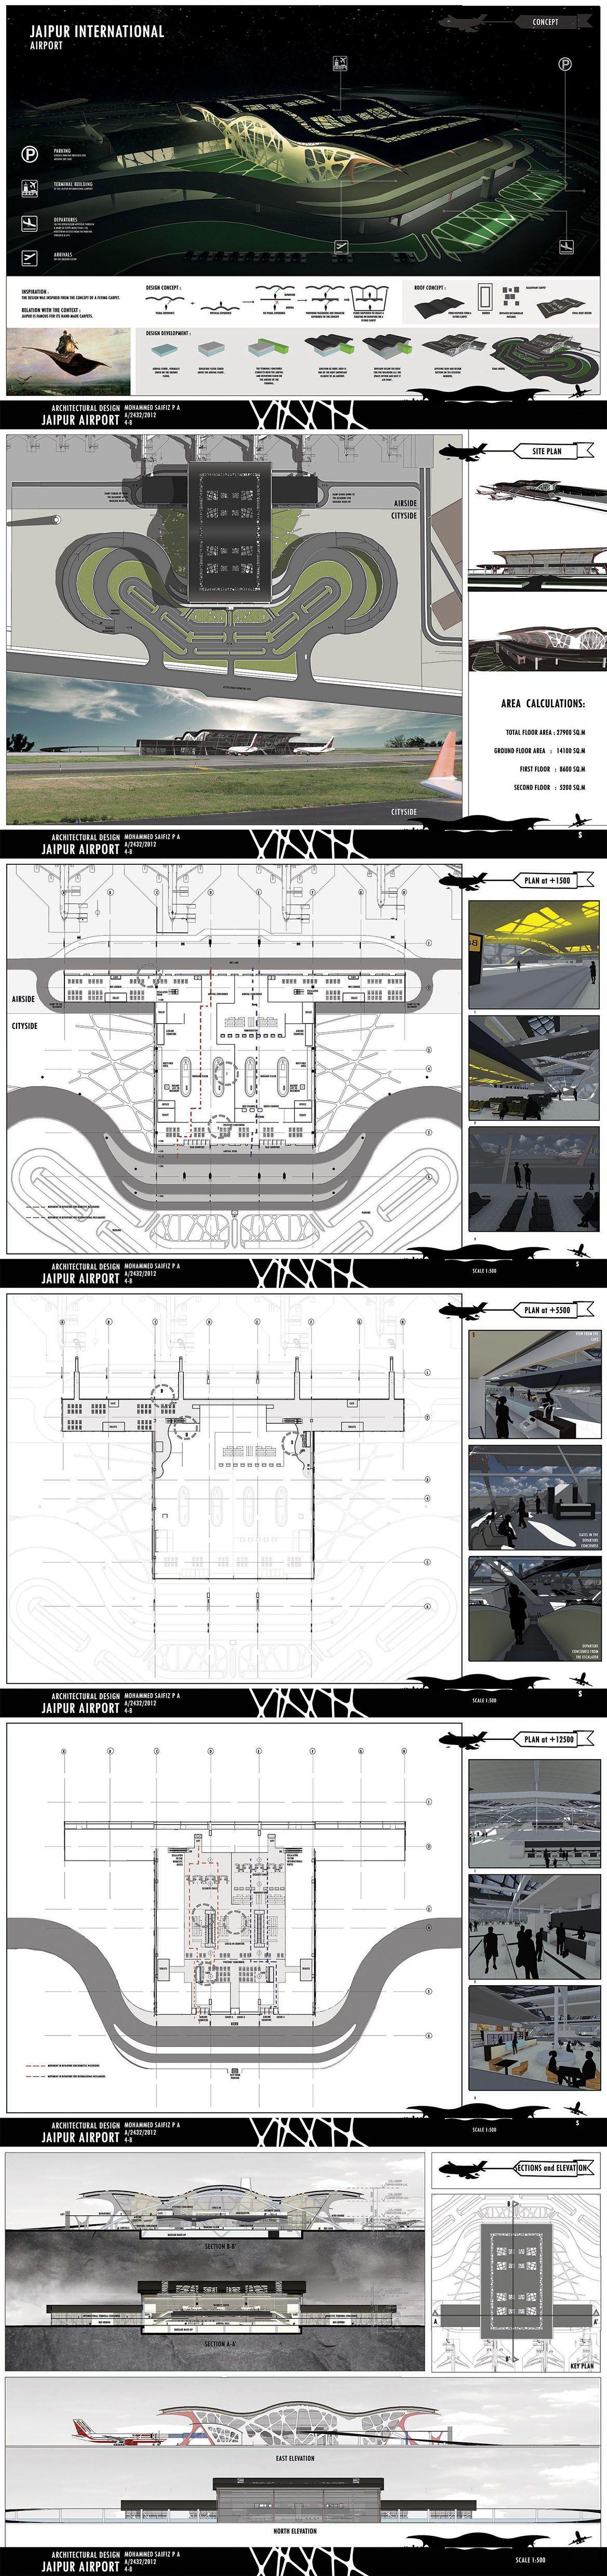 Architecture Design Sheets jaipur airport design - studio project - sem vii architecture